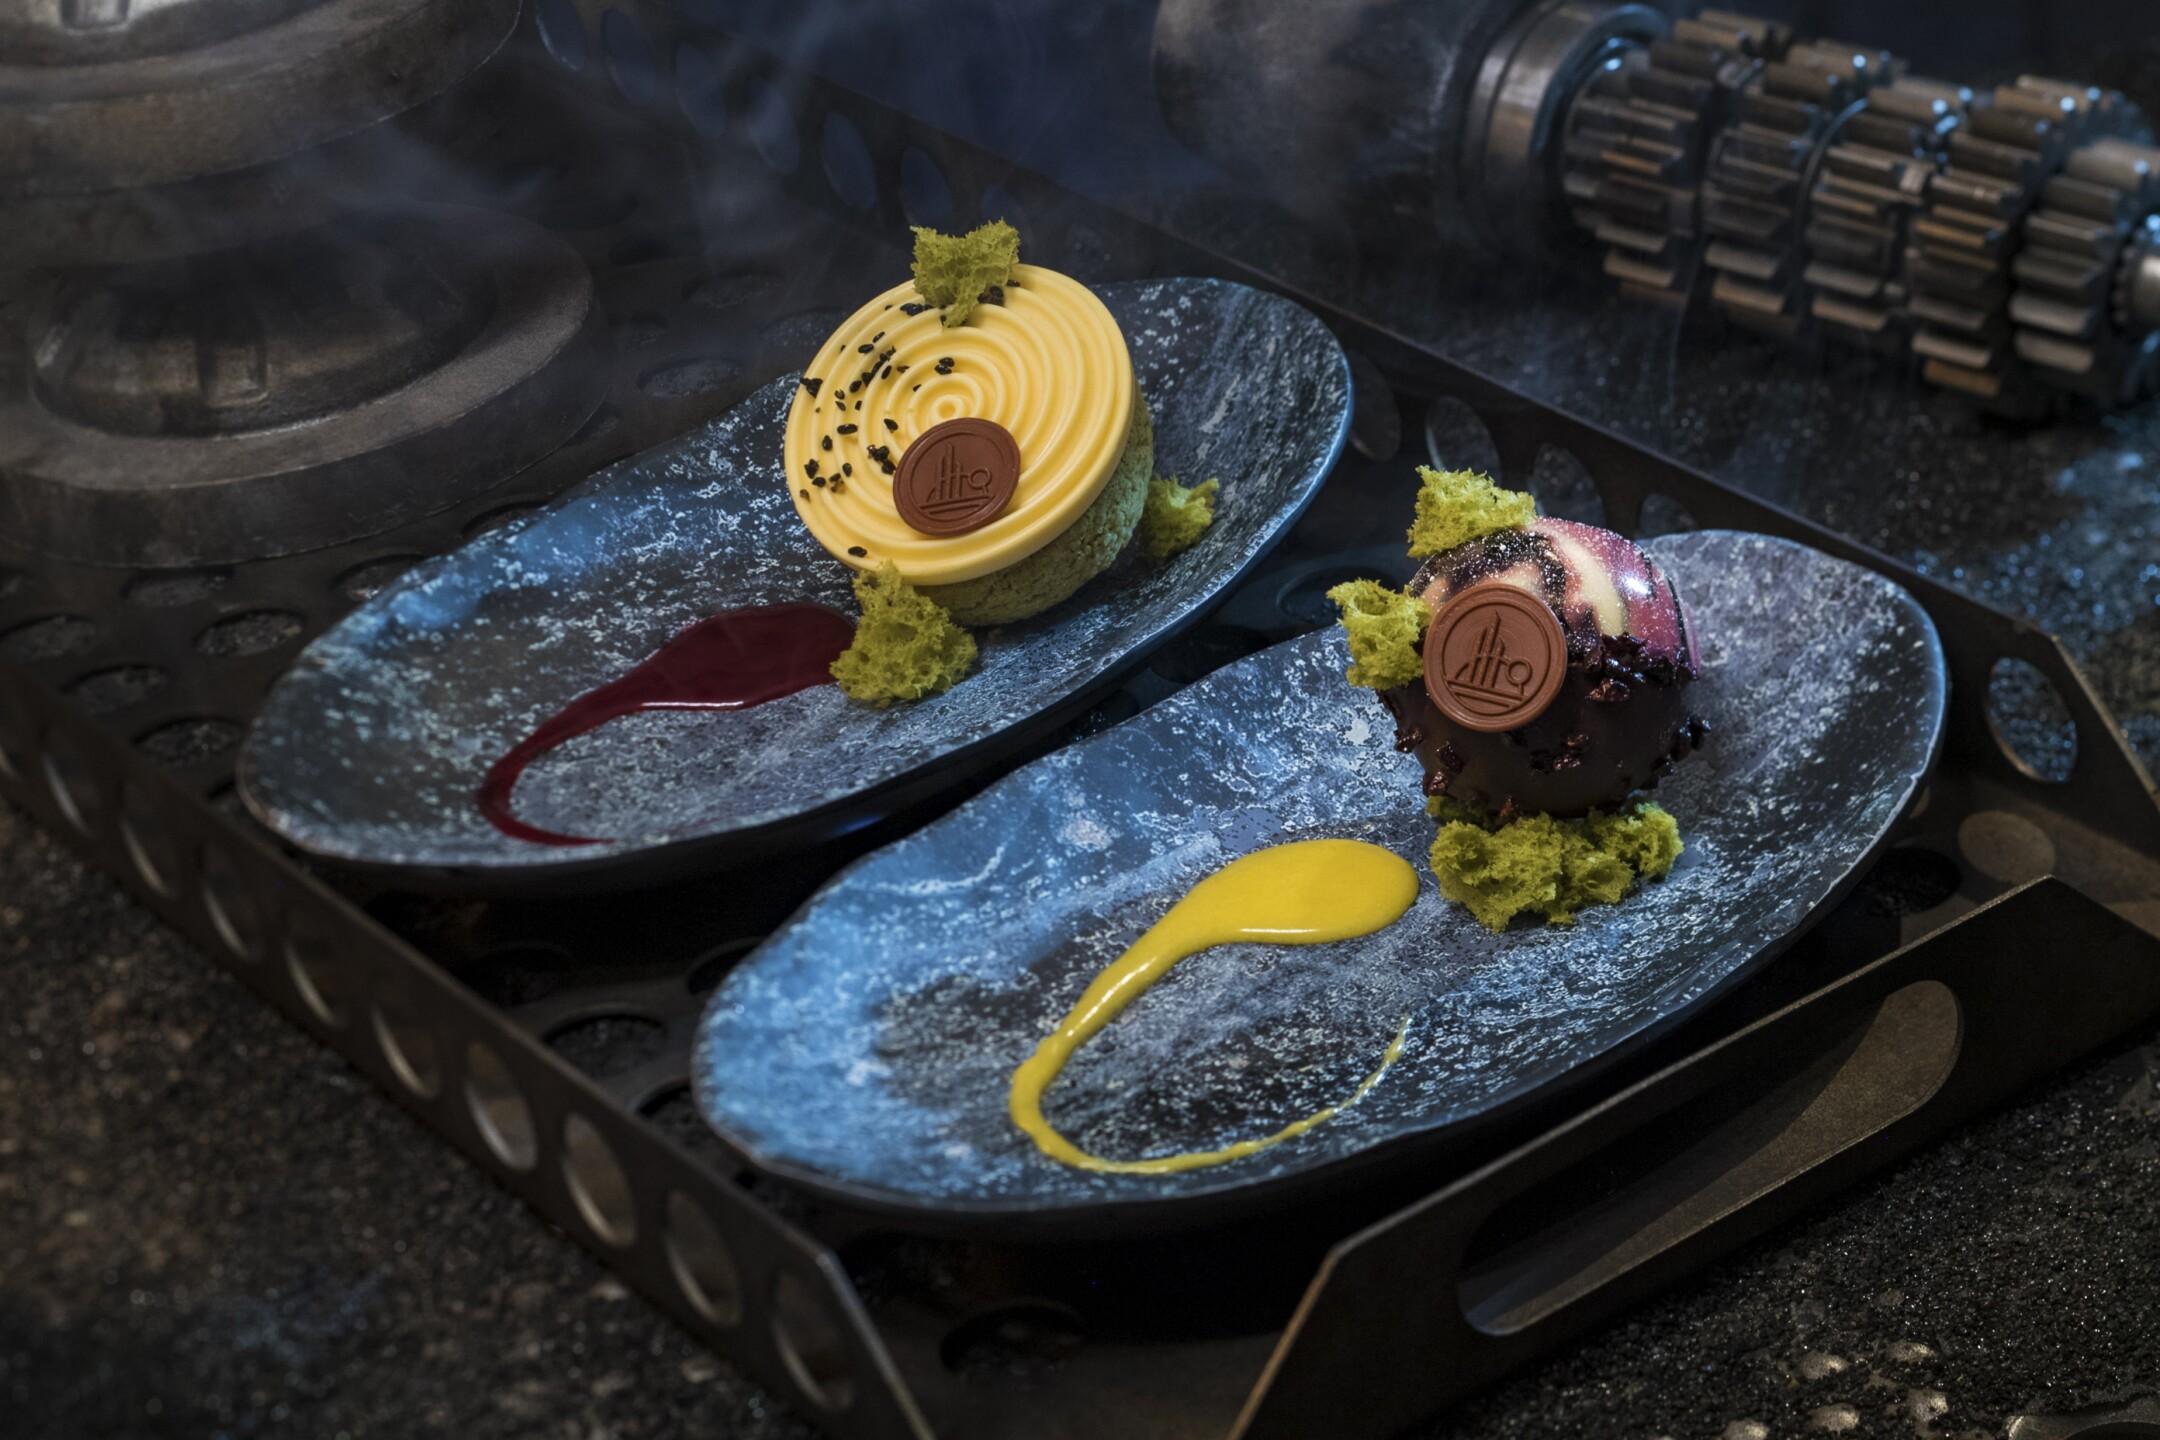 Star Wars: Galaxy's Edge - Docking Bay 7 Food and Cargo Desserts